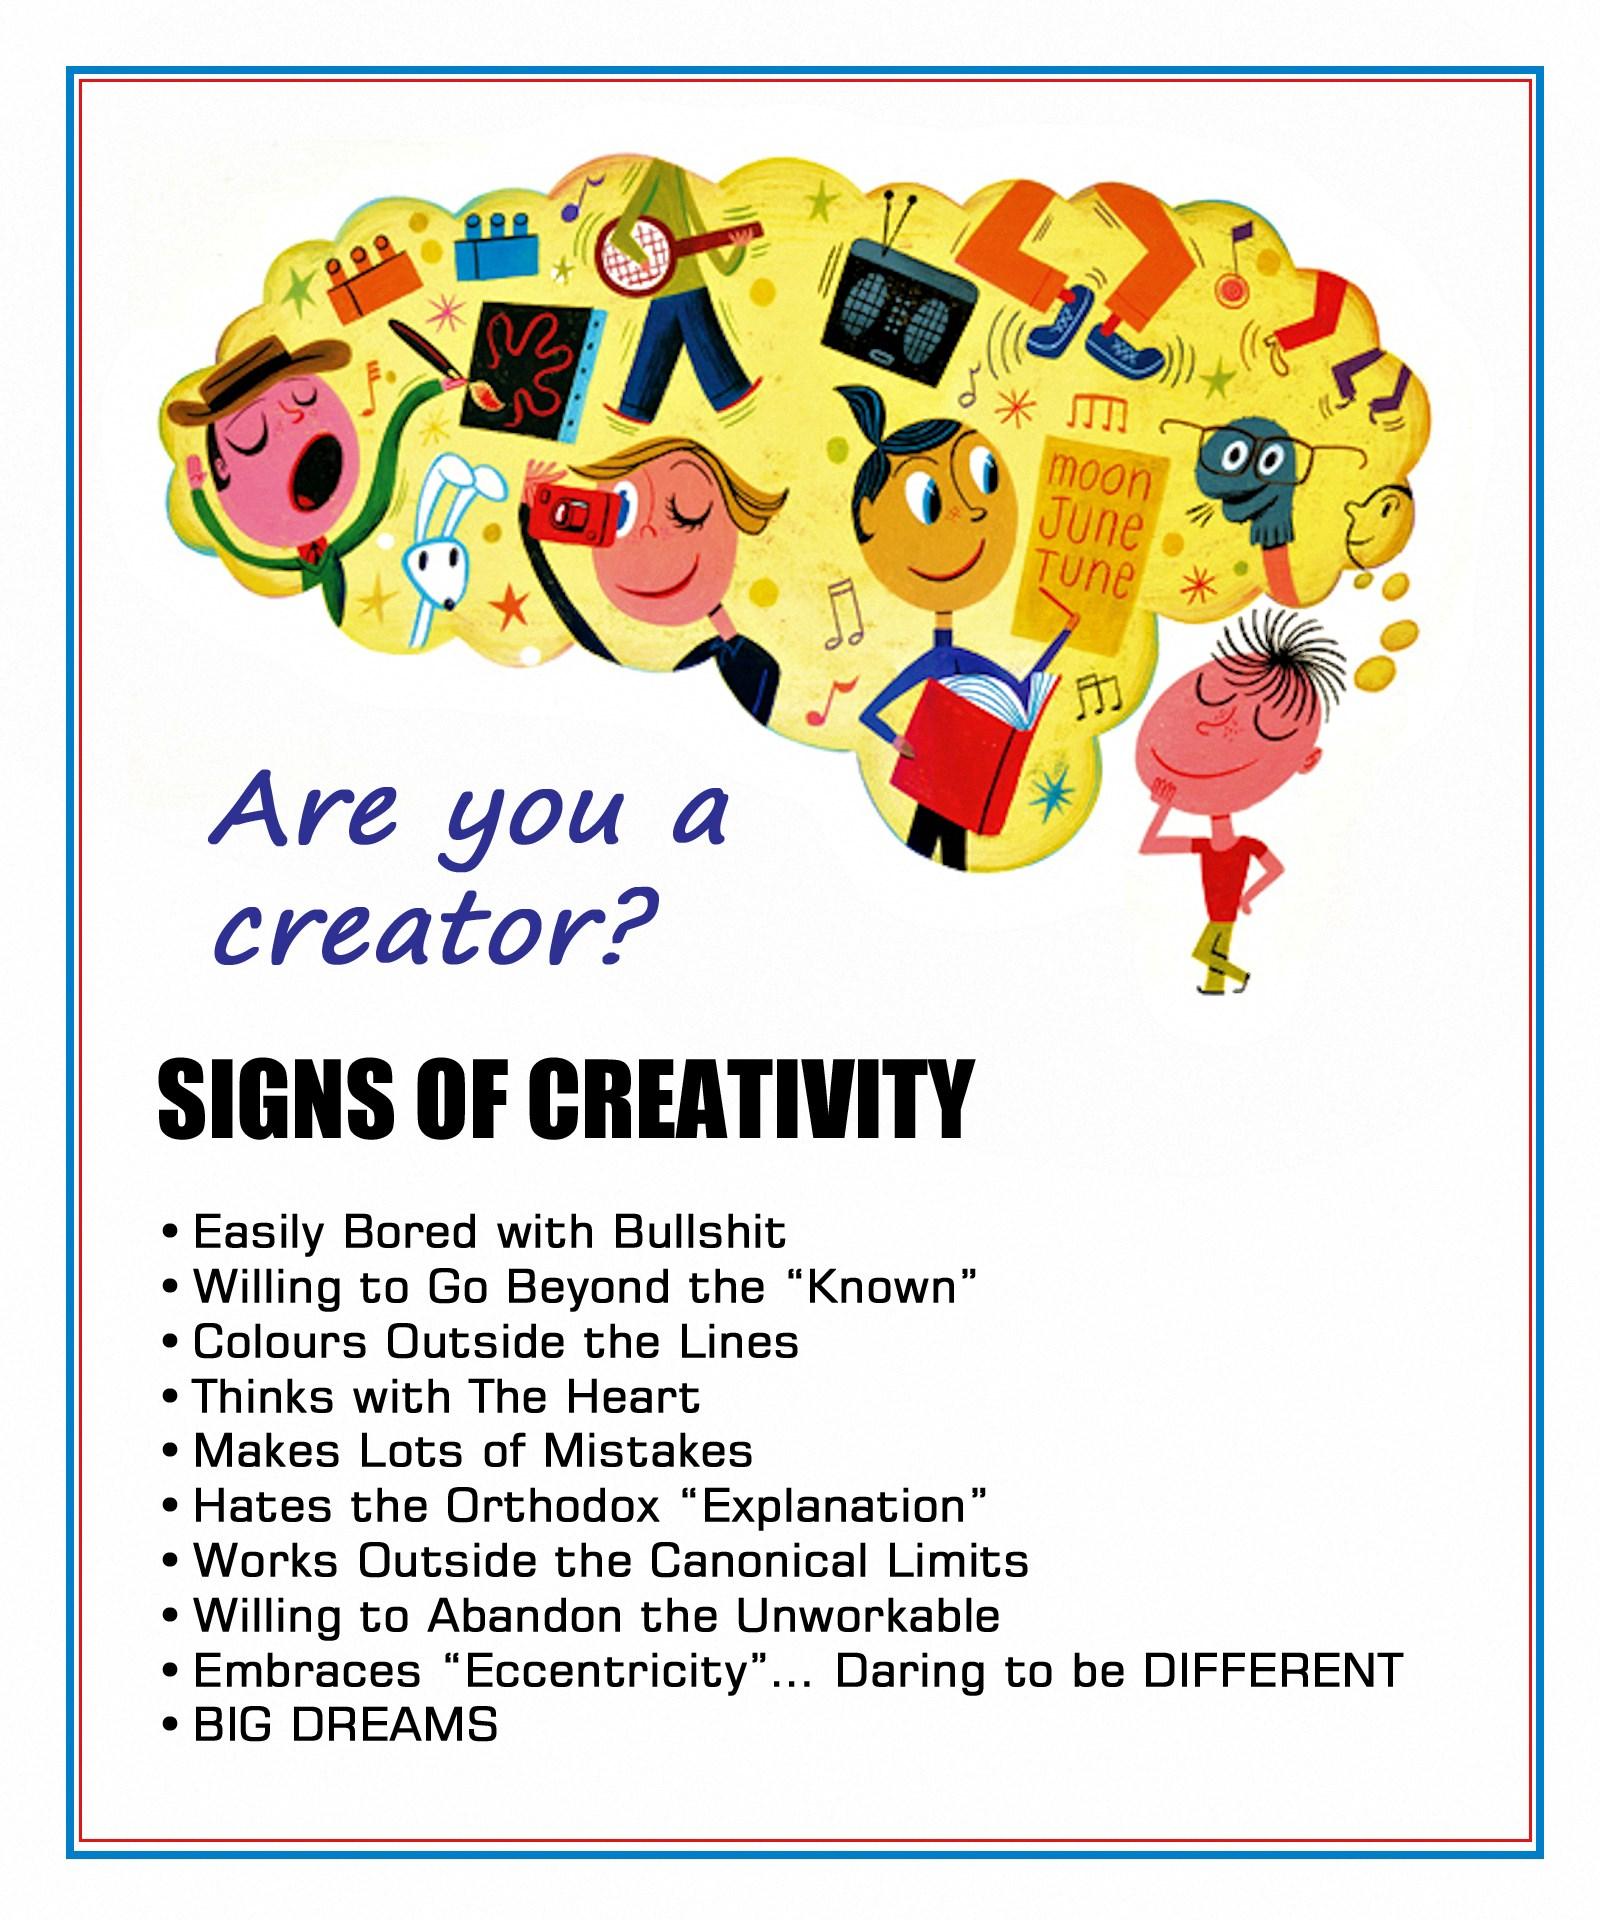 00 creative people. 28.04.15